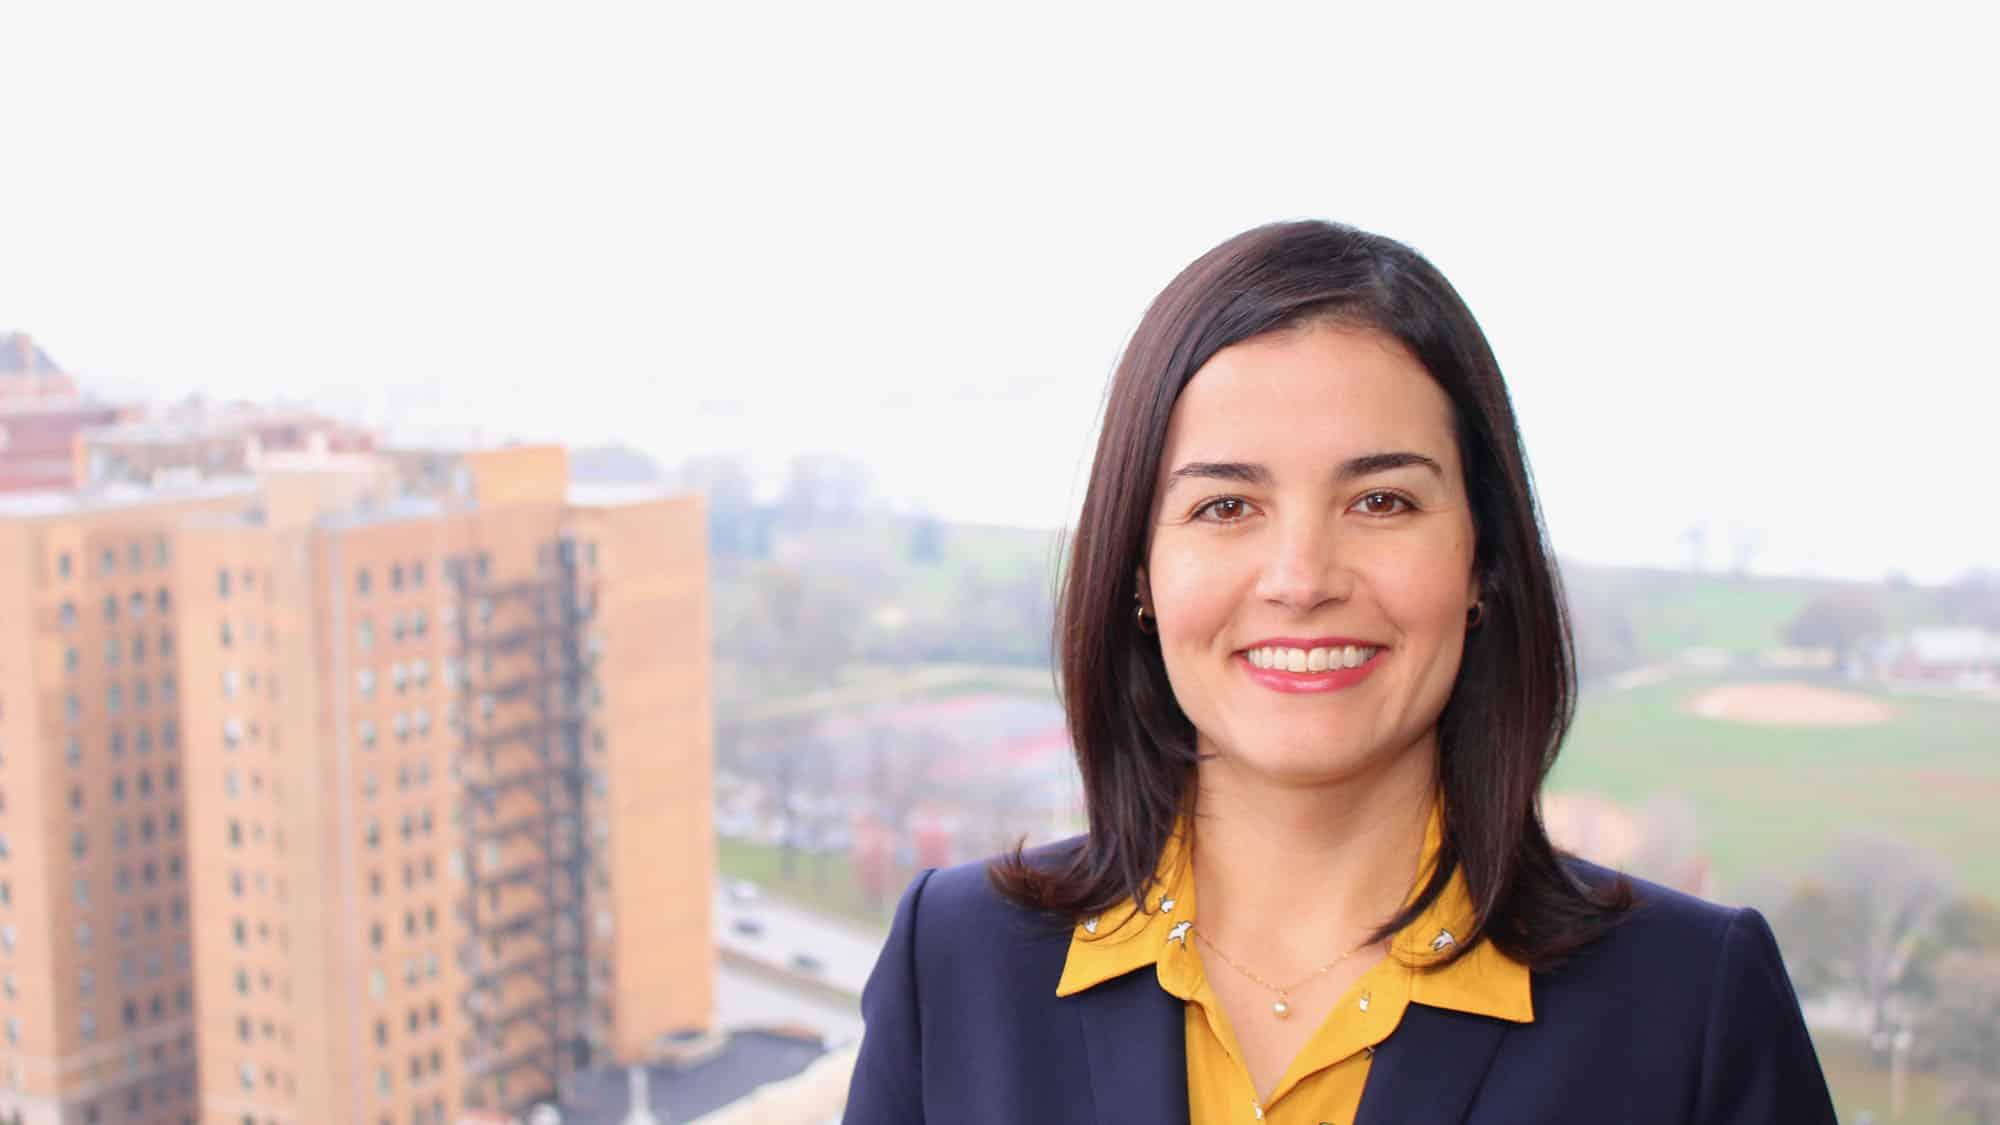 Meet Karina Freitag, PhD, Senior Talent Solutions Expert